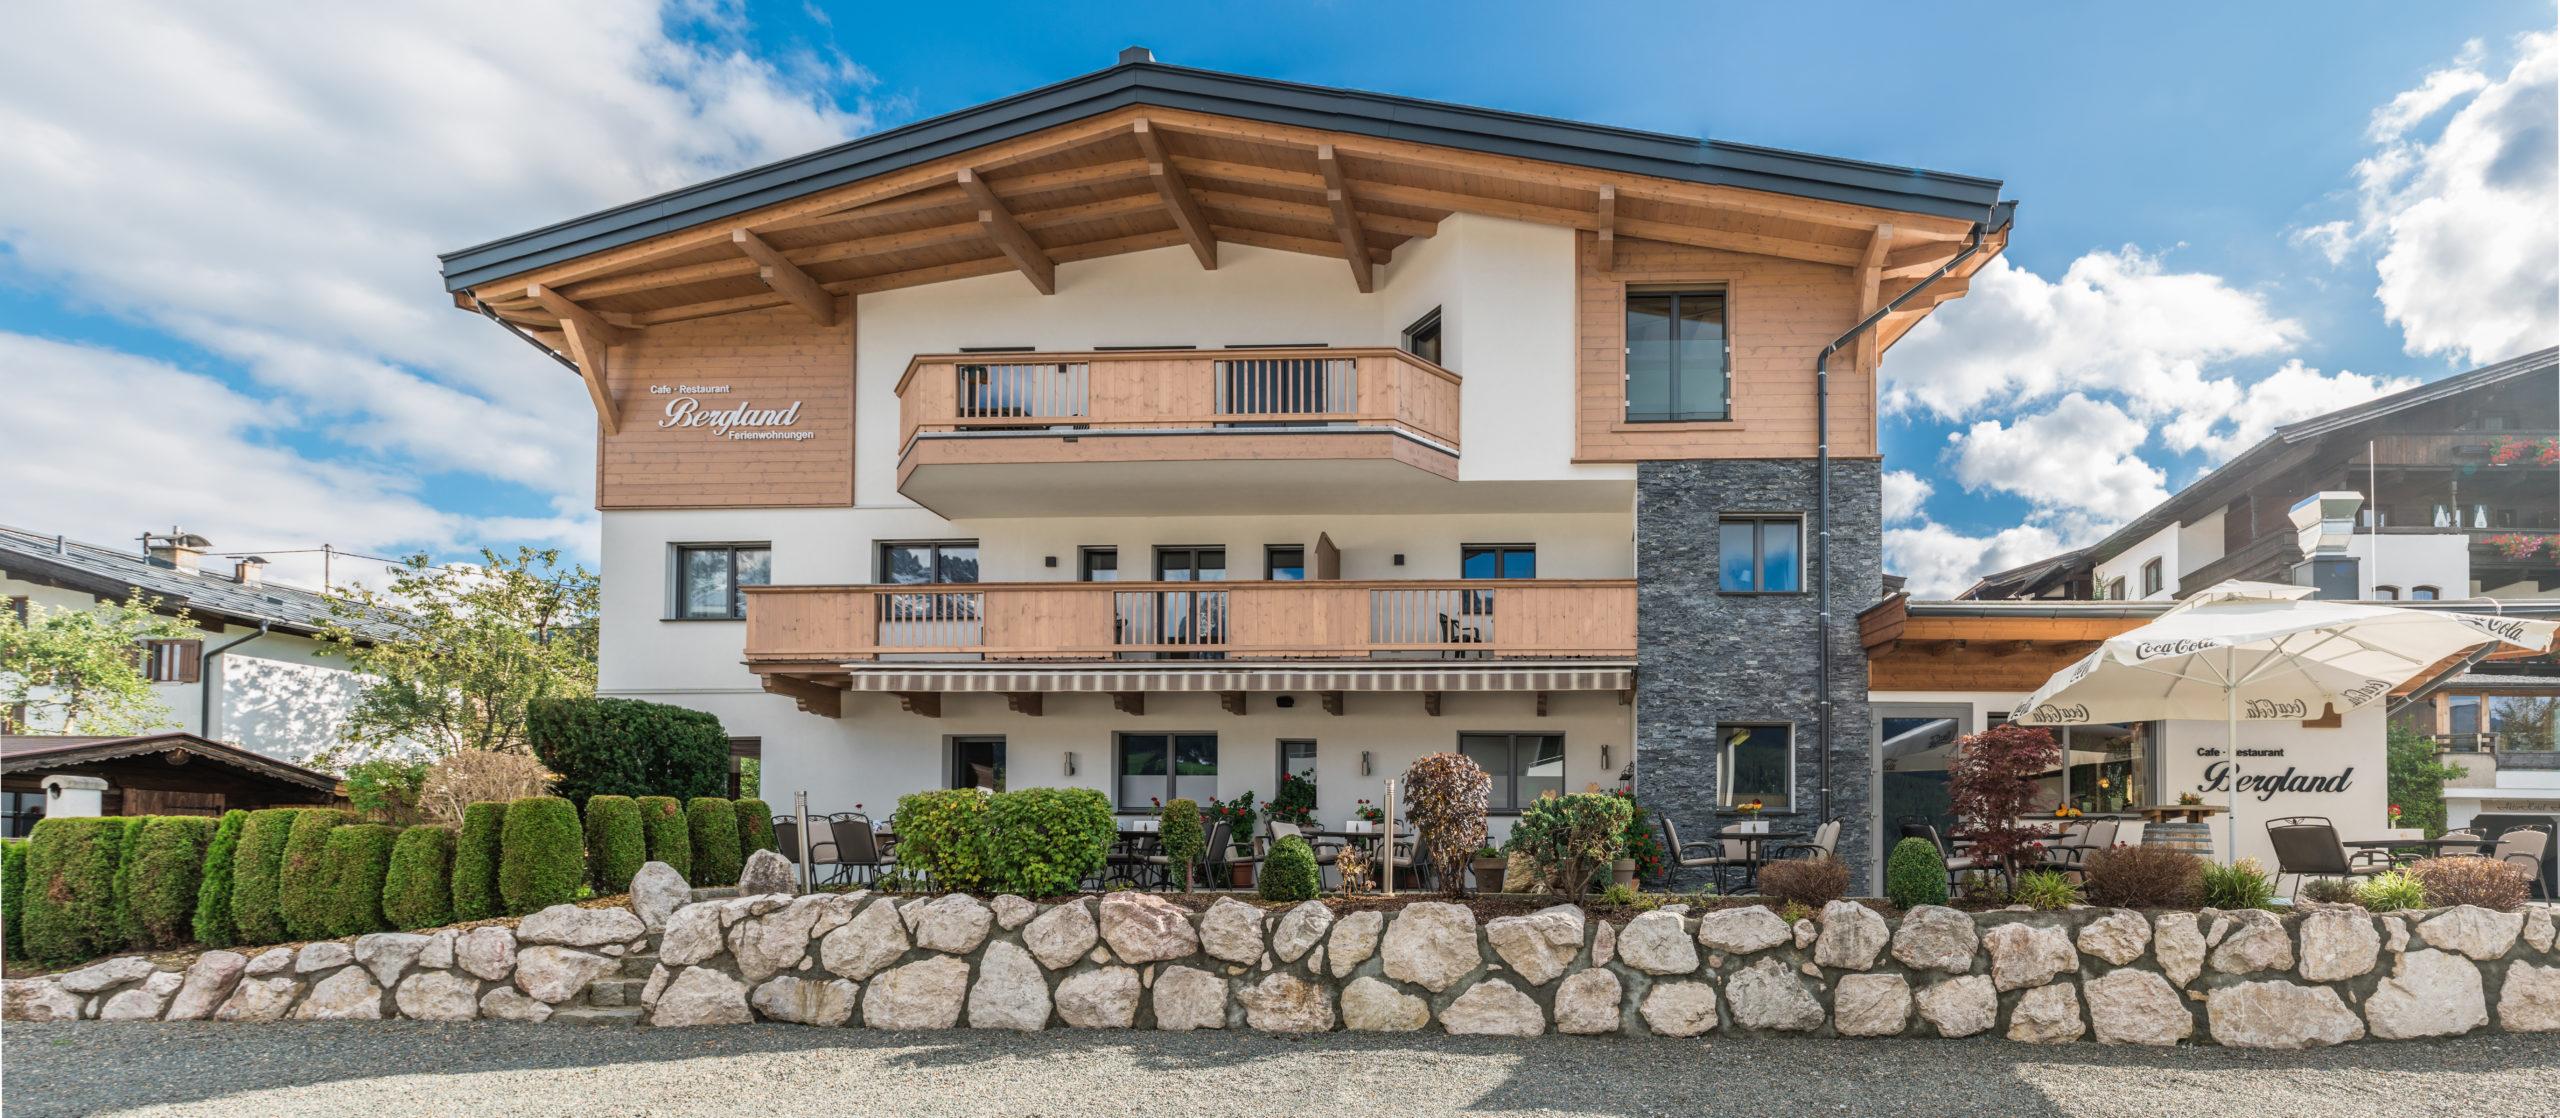 Bergland_Ellmau_Tirol_Restaurant_Haus